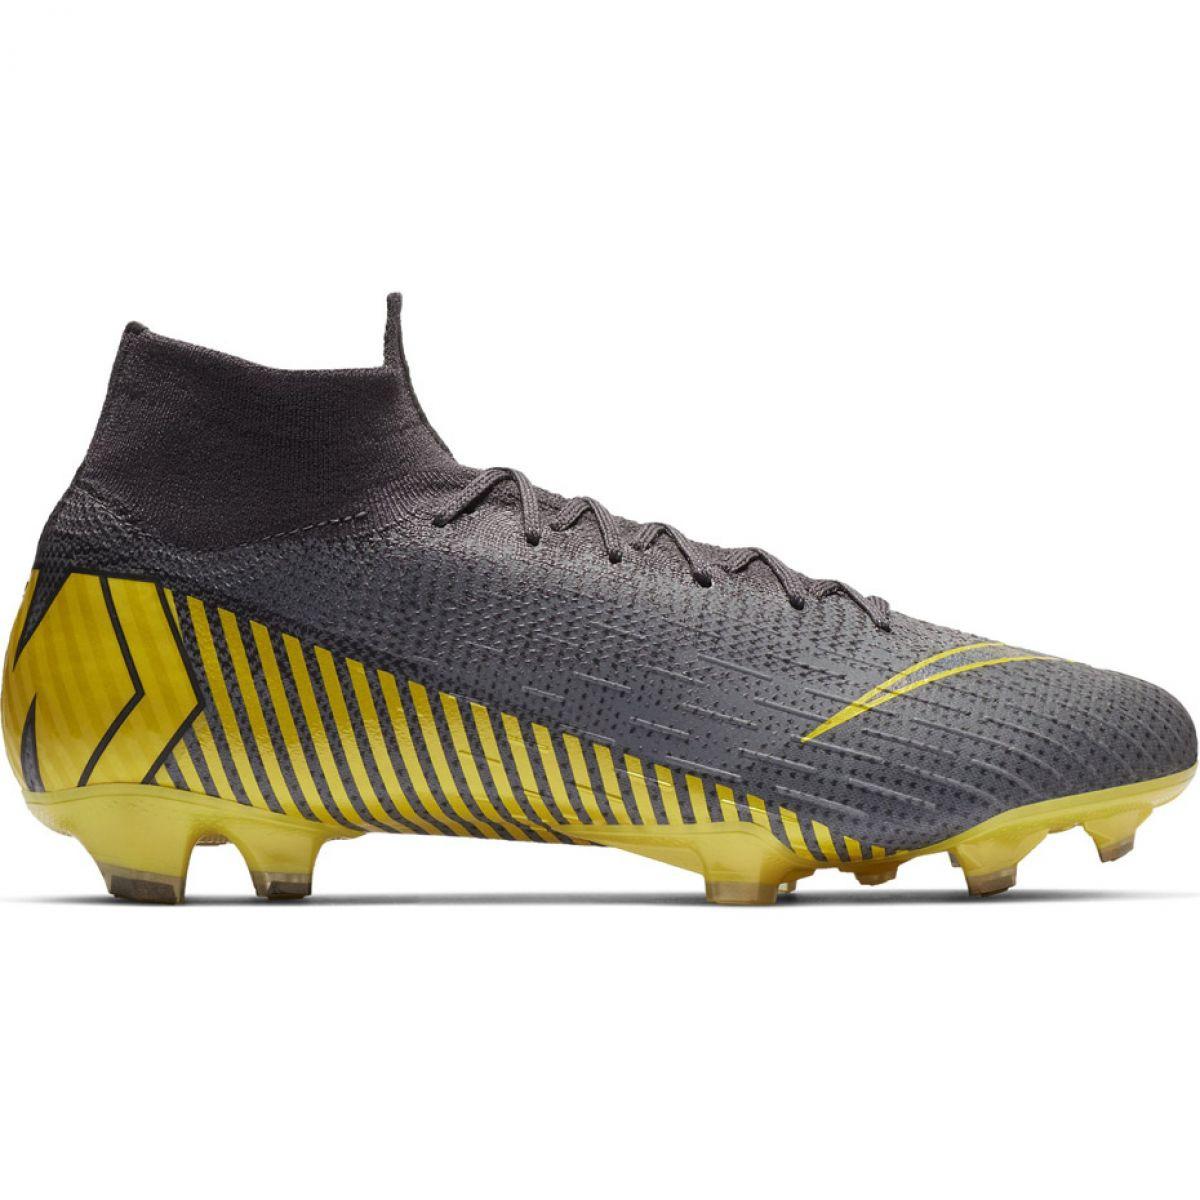 Zapatillas 6 Ah7365 Fútbol Fg M Nike 070 Mercurial De Superfly Elite Kl3T1FJc